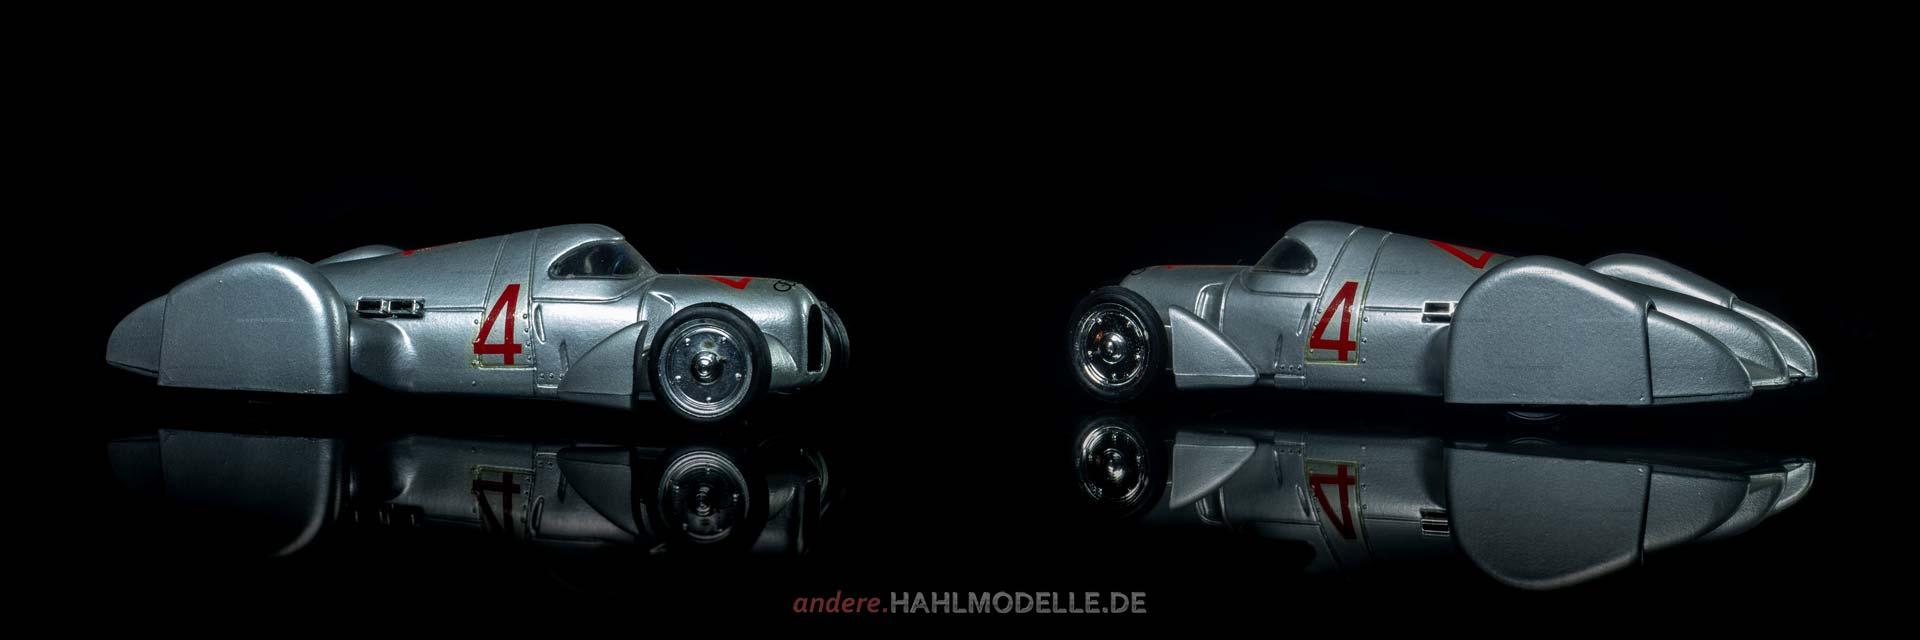 Auto Union Rekordwagen Typ C | Experimentalfahrzeug | Brumm | 1:43 | www.andere.hahlmodelle.de